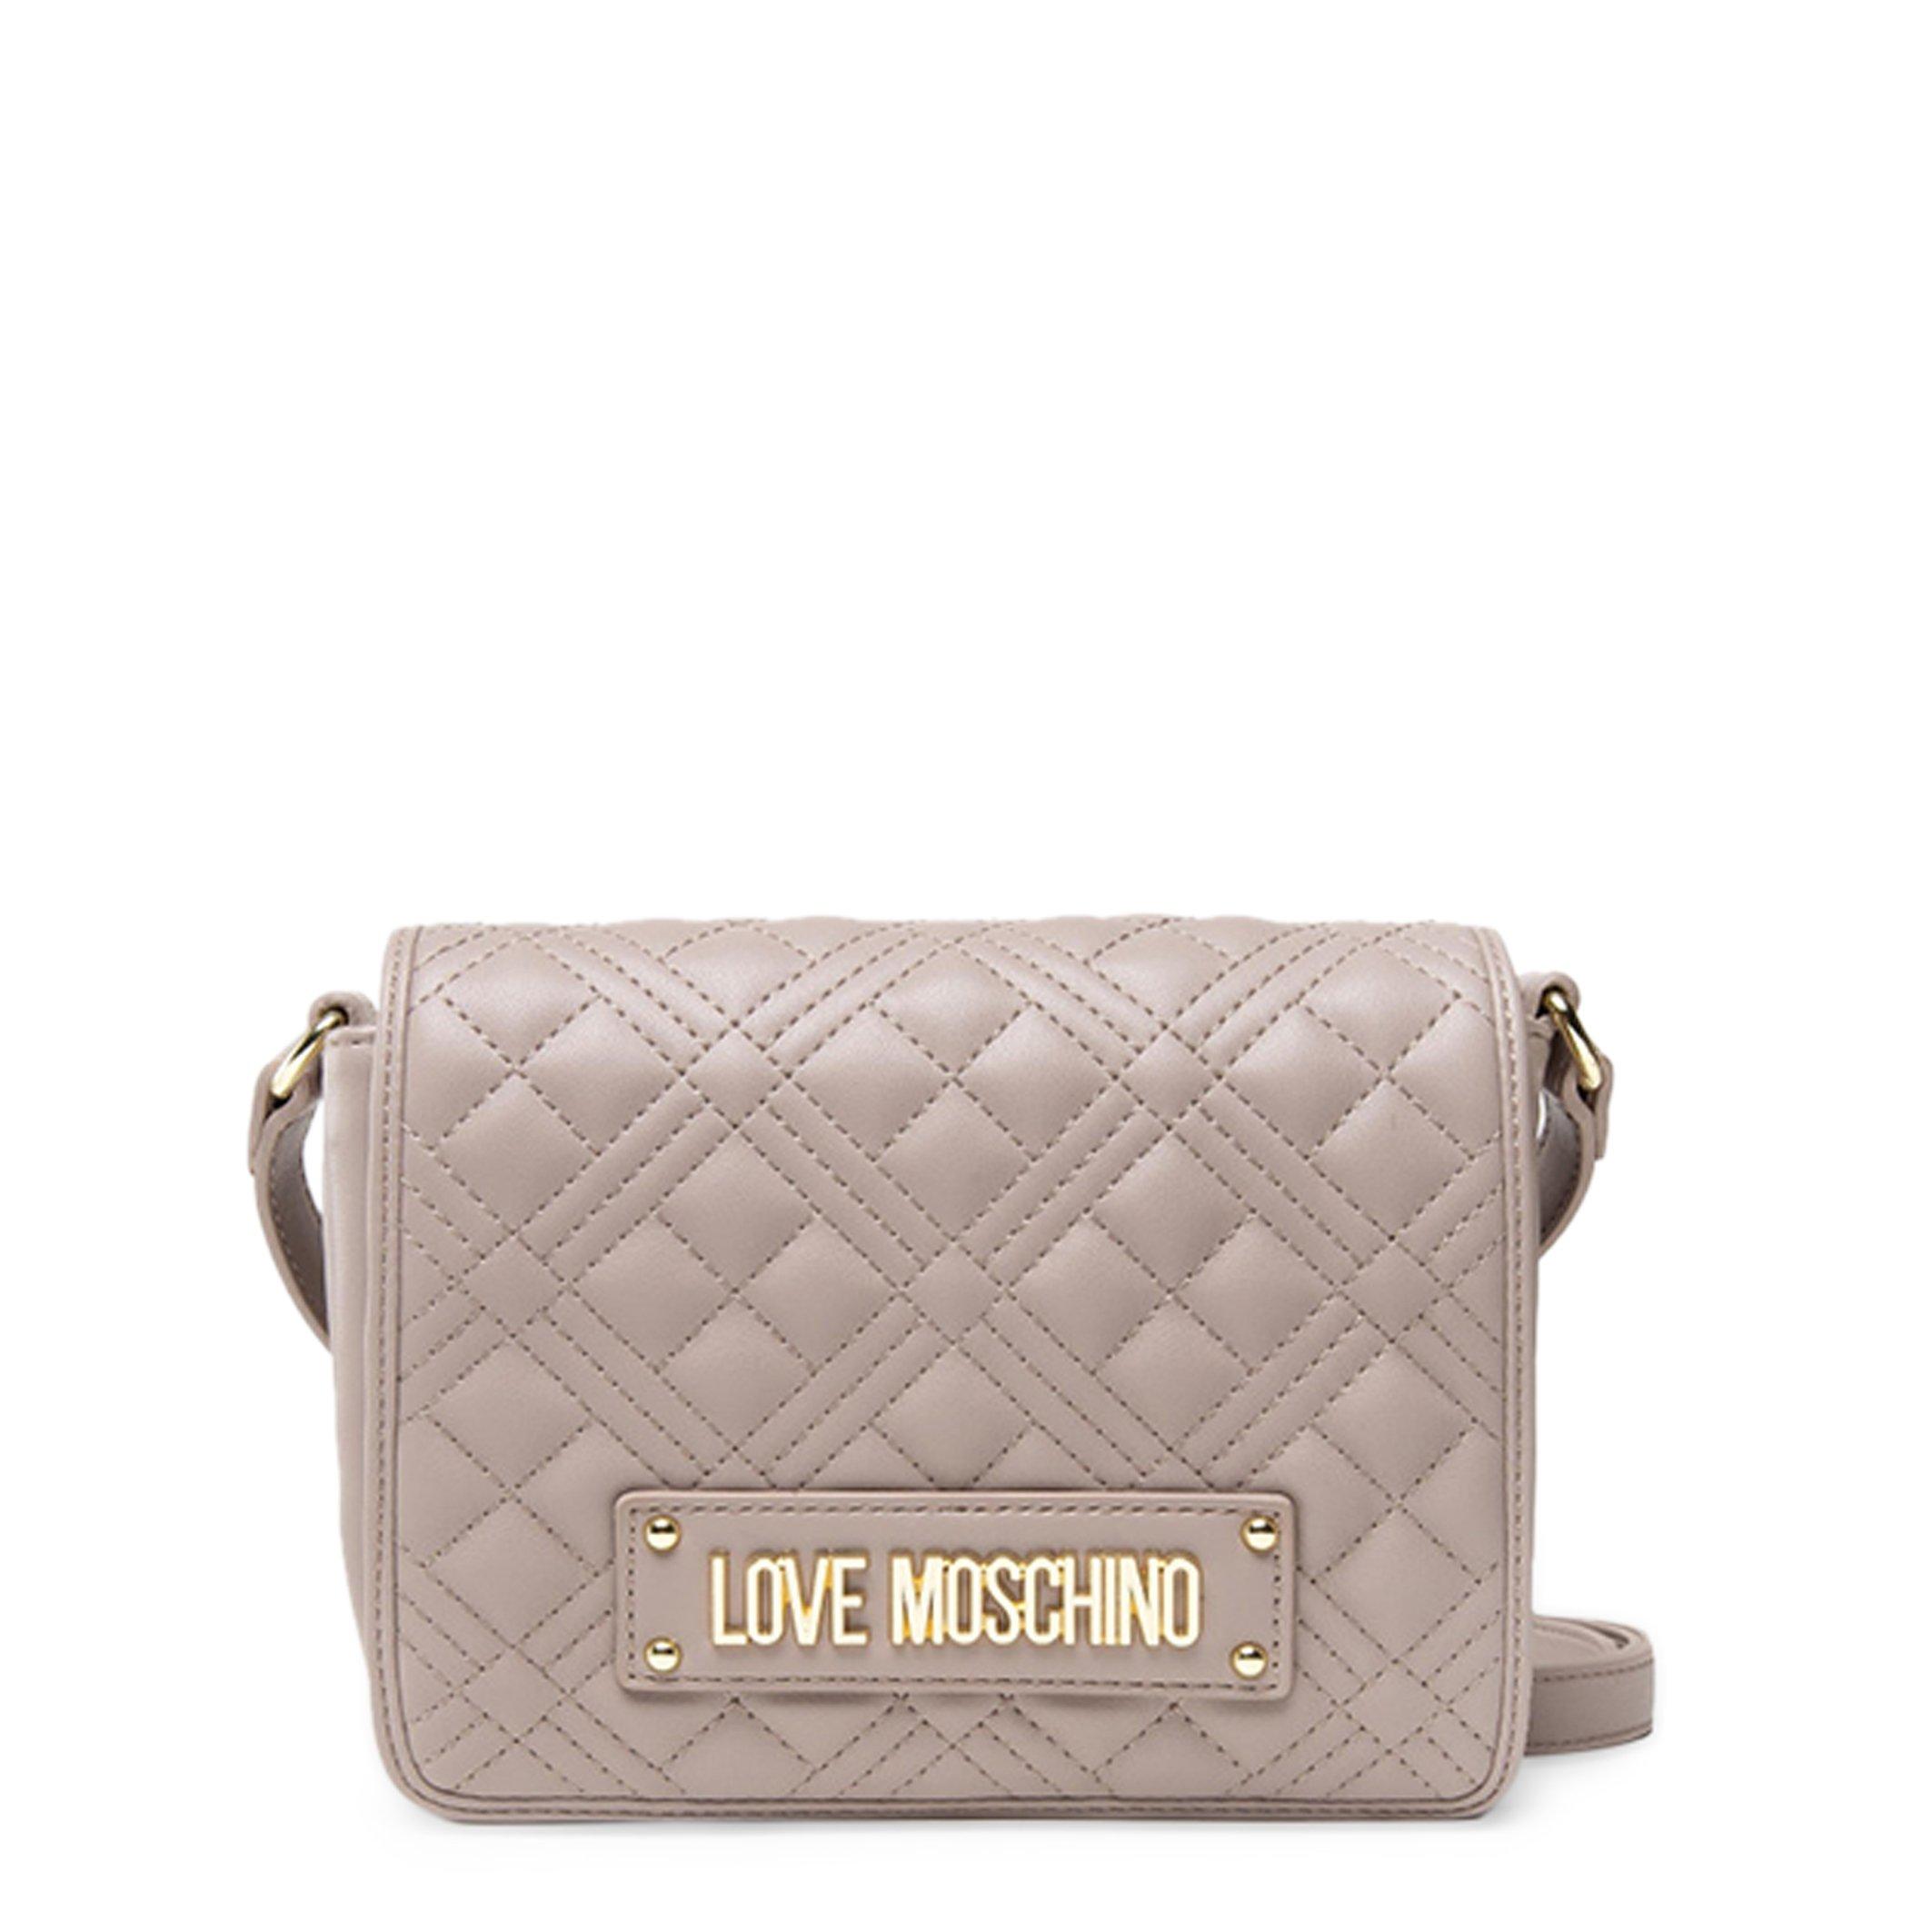 Love Moschino Women's Crossbody Bag Various Colours JC4002PP1DLA0 - grey NOSIZE